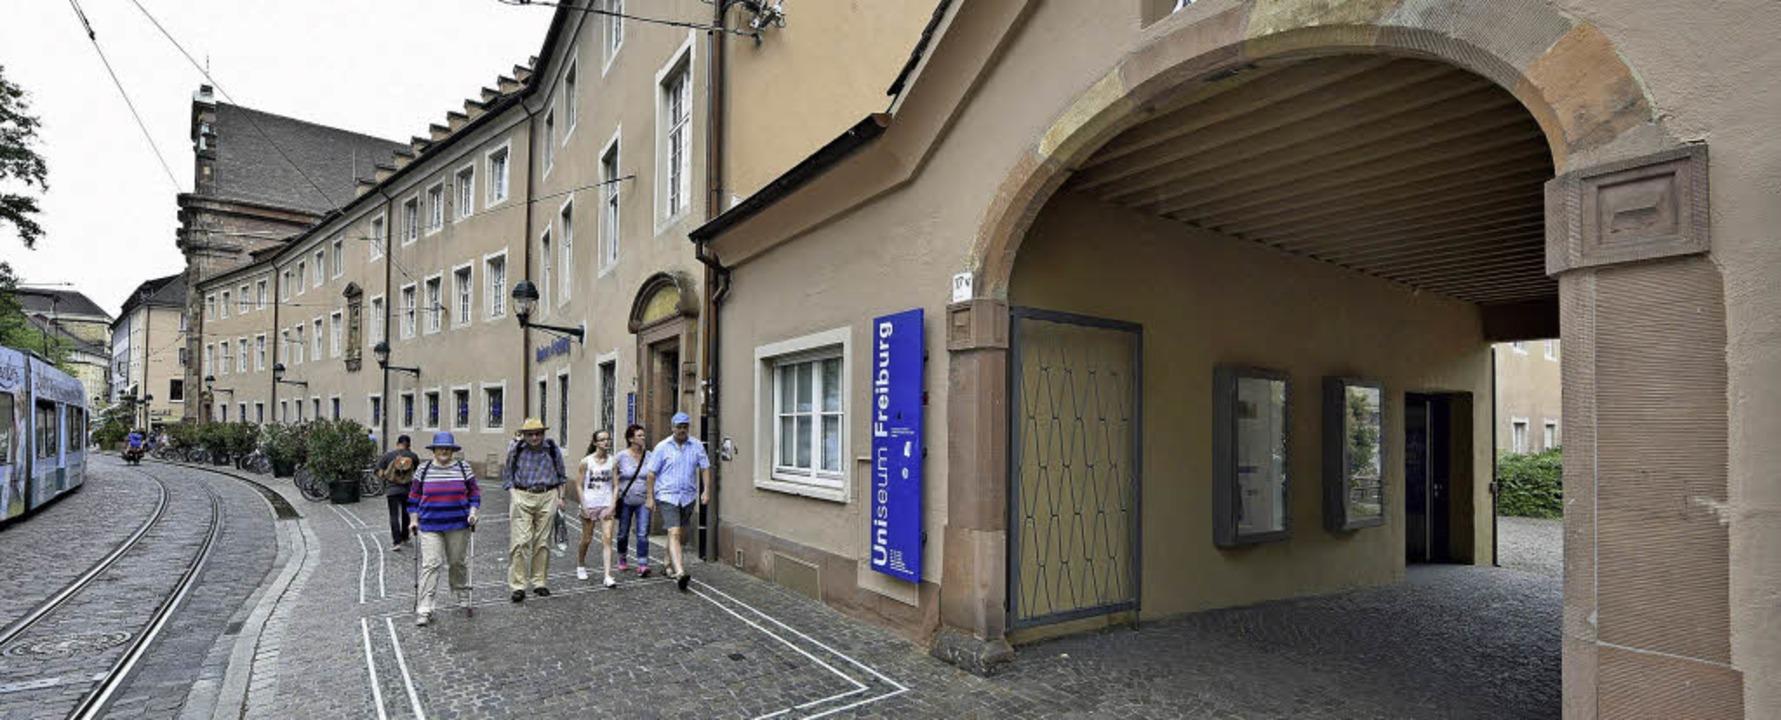 In der Alten Universität an der Bertol...lf Monaten das Literaturhaus Freiburg.  | Foto: michael bamberger